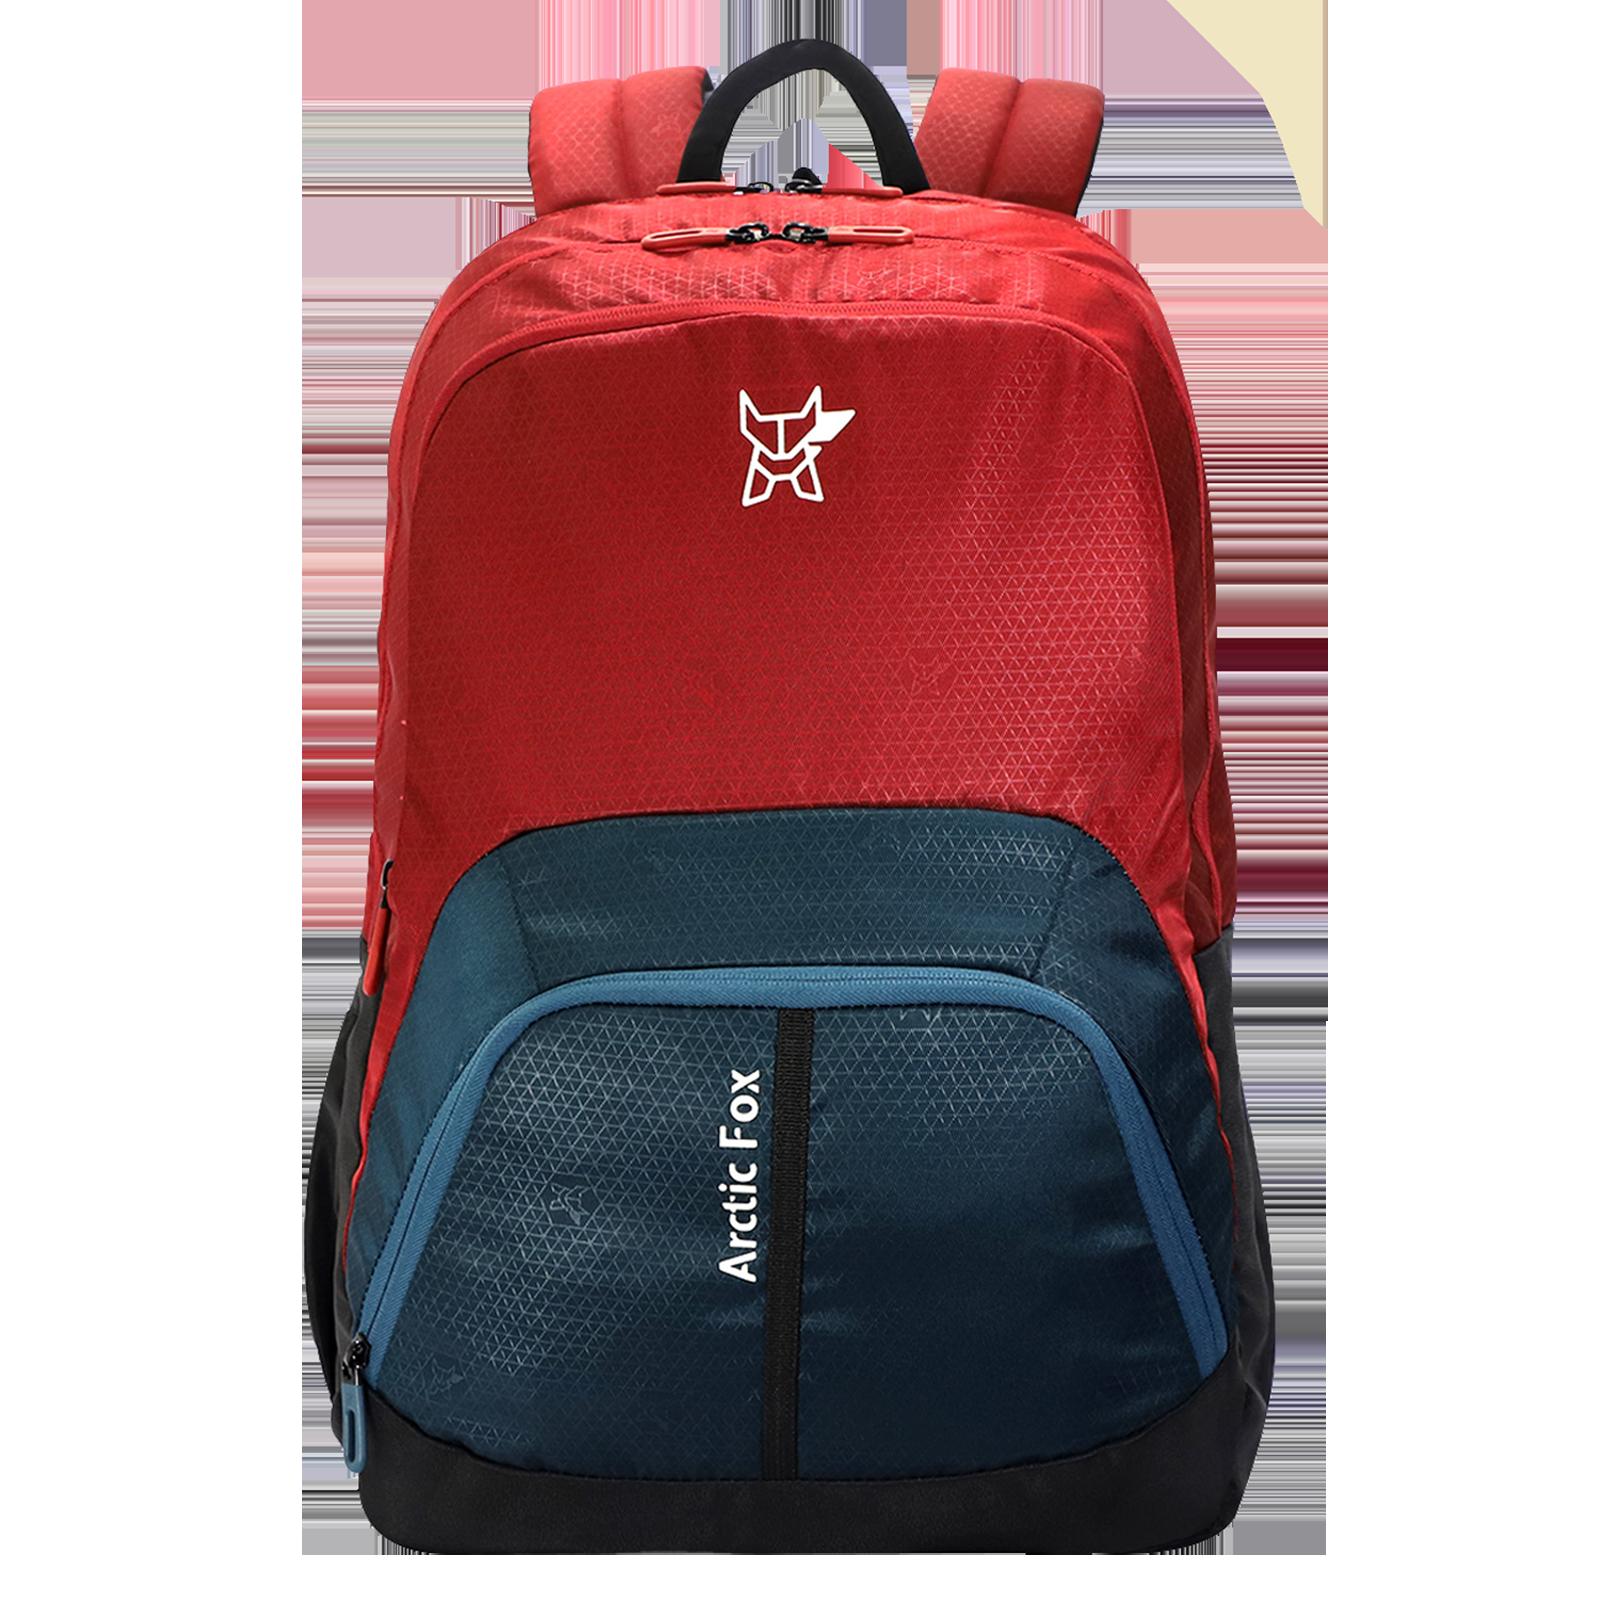 Arctic Fox Dahlia 42.5 Litres Polyester Backpack (Fresh Design, FJUBPKRDLON017043, Bonnet Red)_1